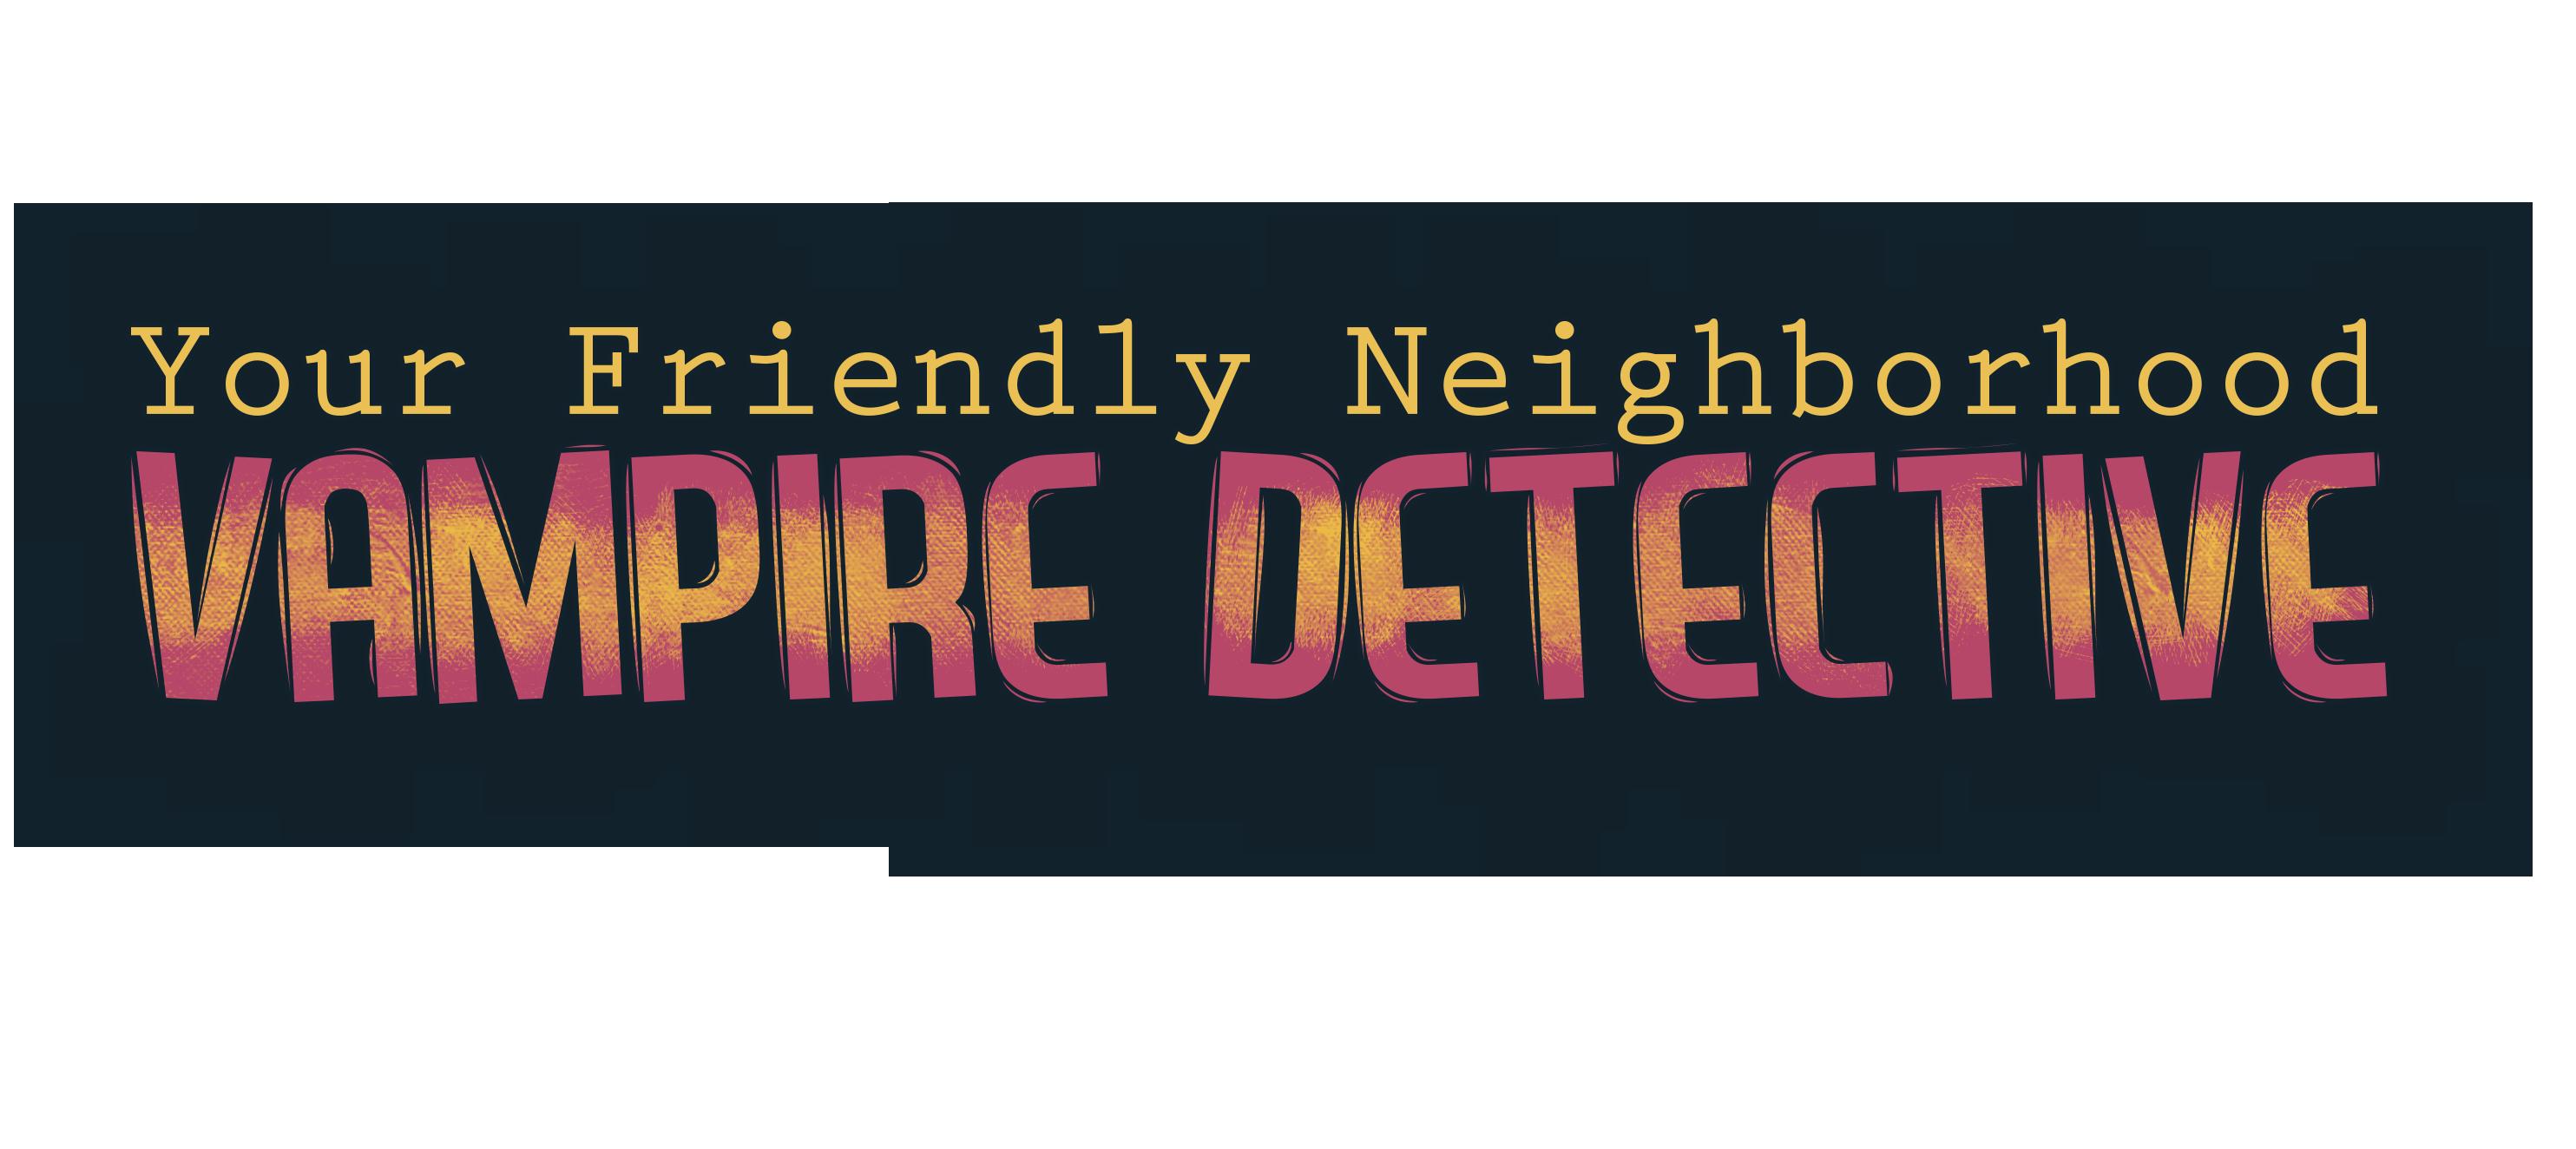 Your Friendly Neighborhood Vampire Detective